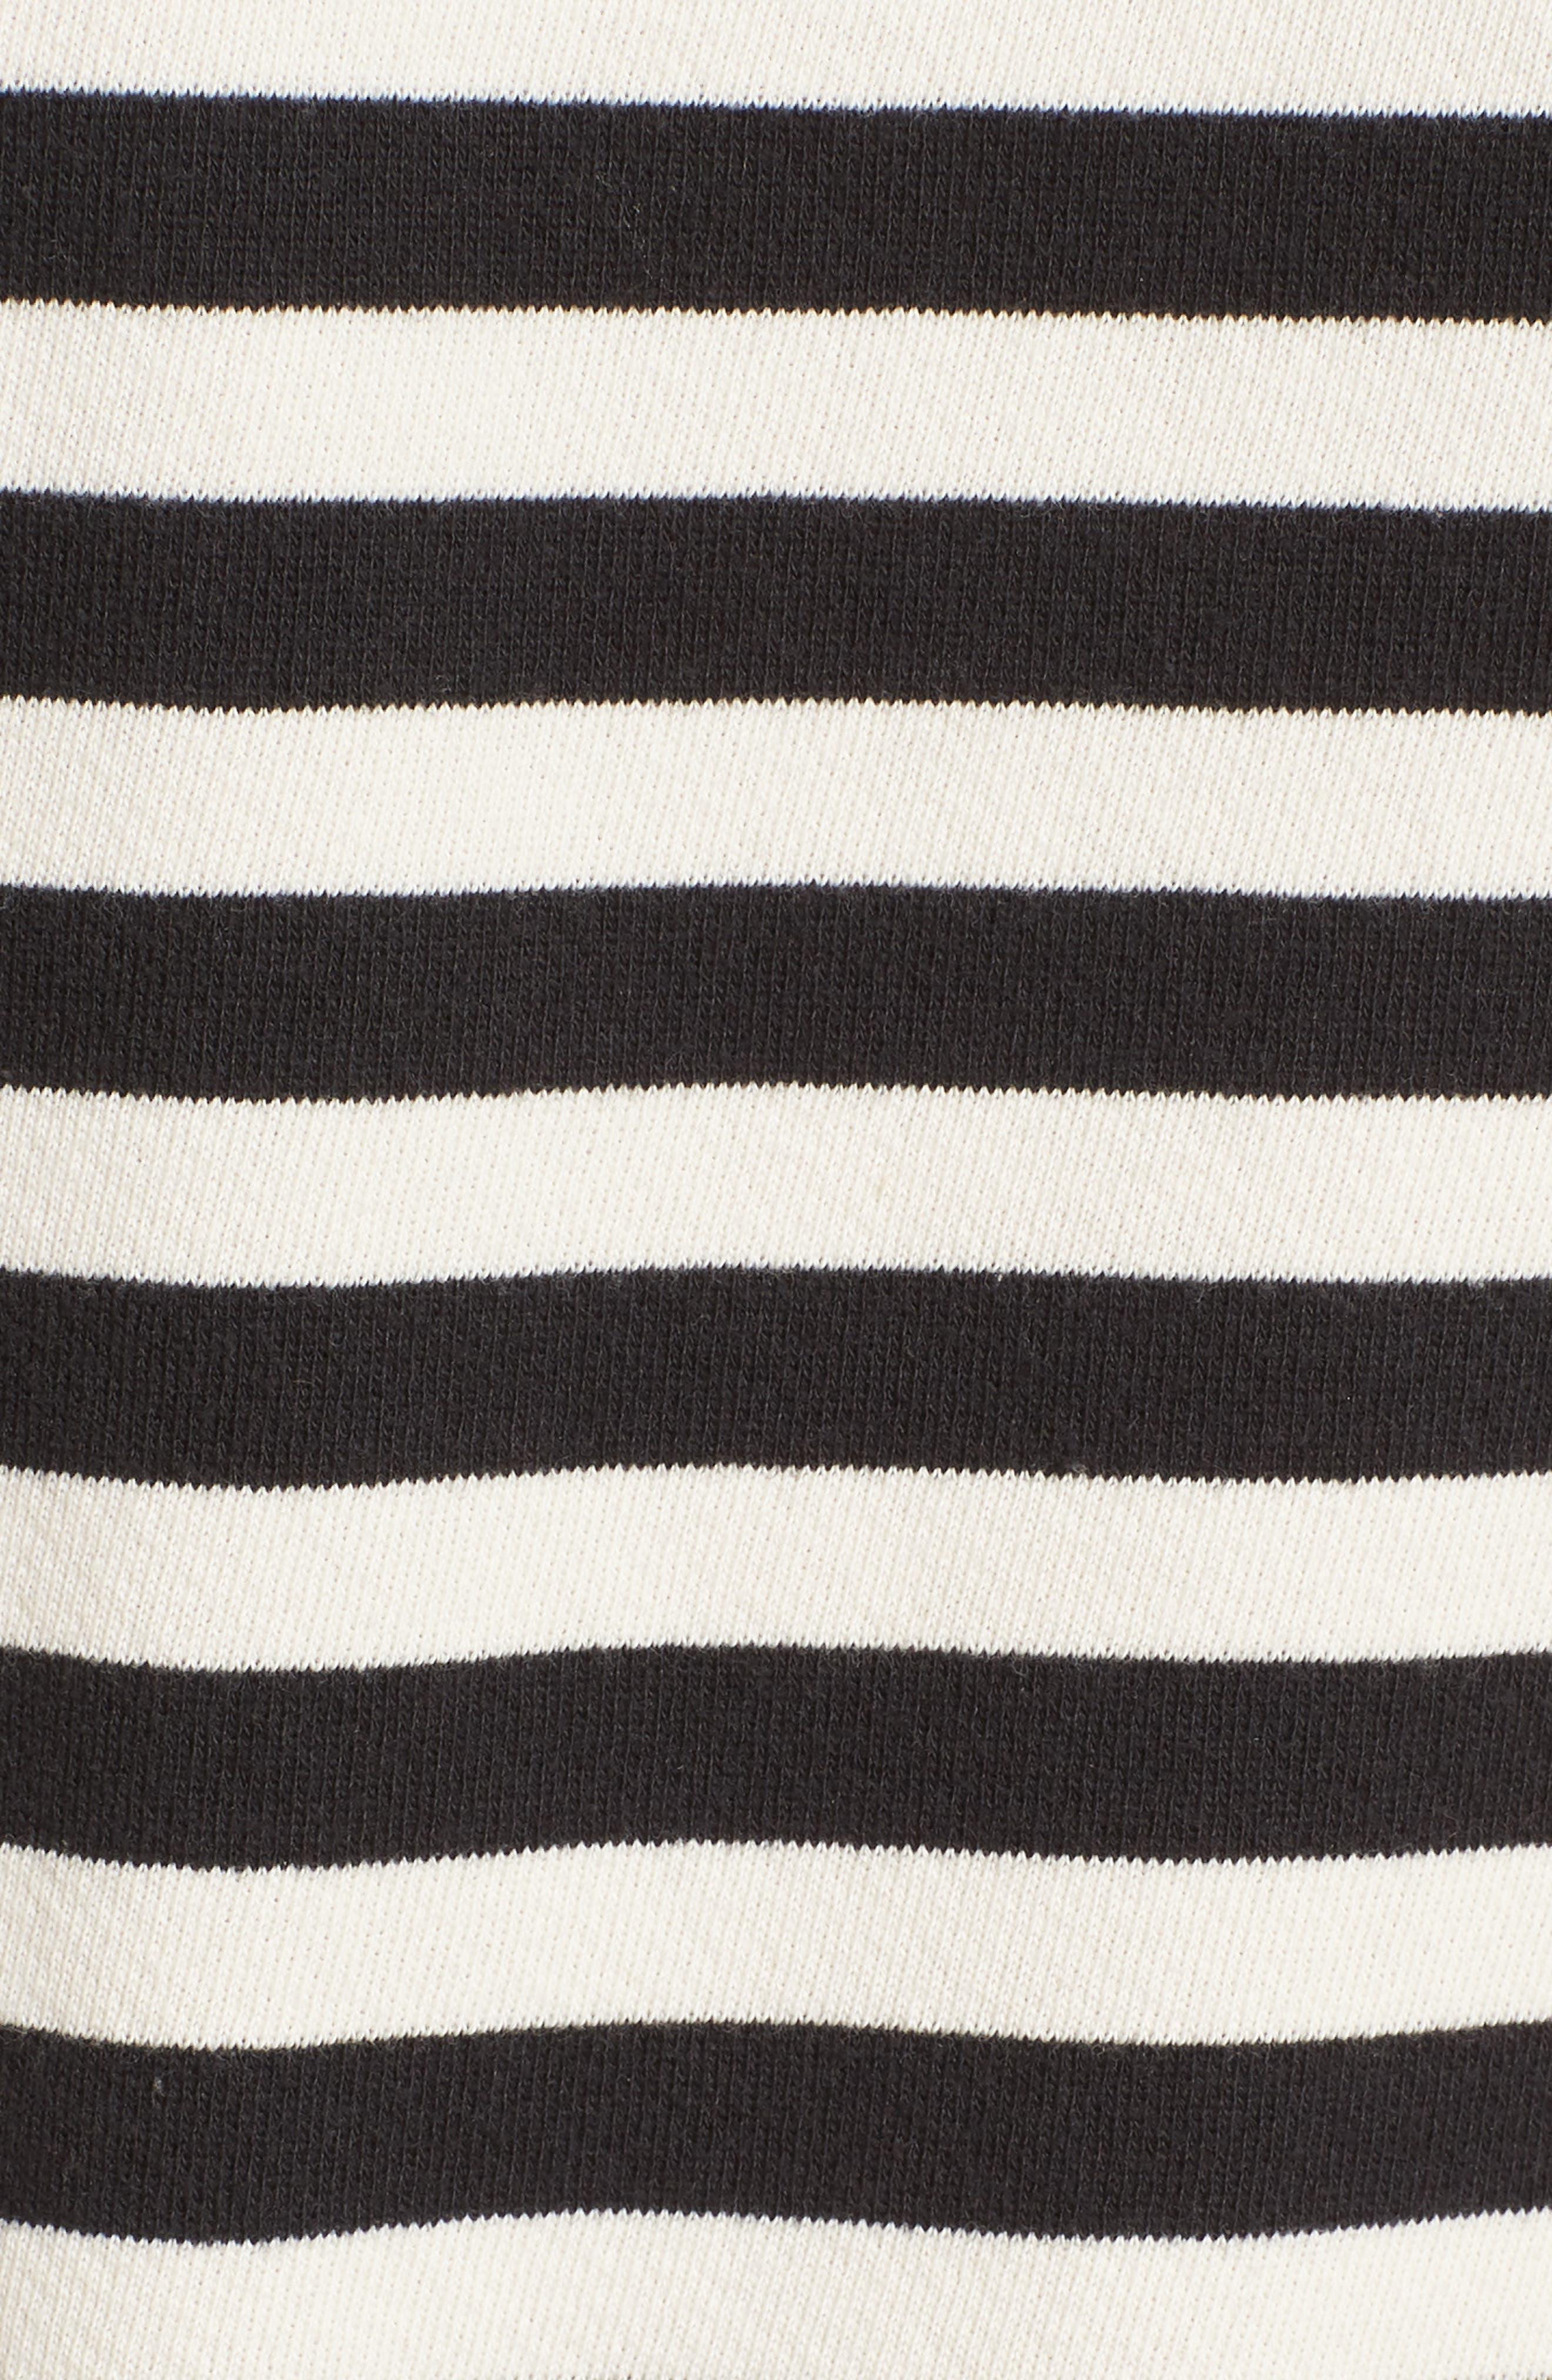 West Village Destroyed Crop Sweatshirt,                             Alternate thumbnail 5, color,                             004